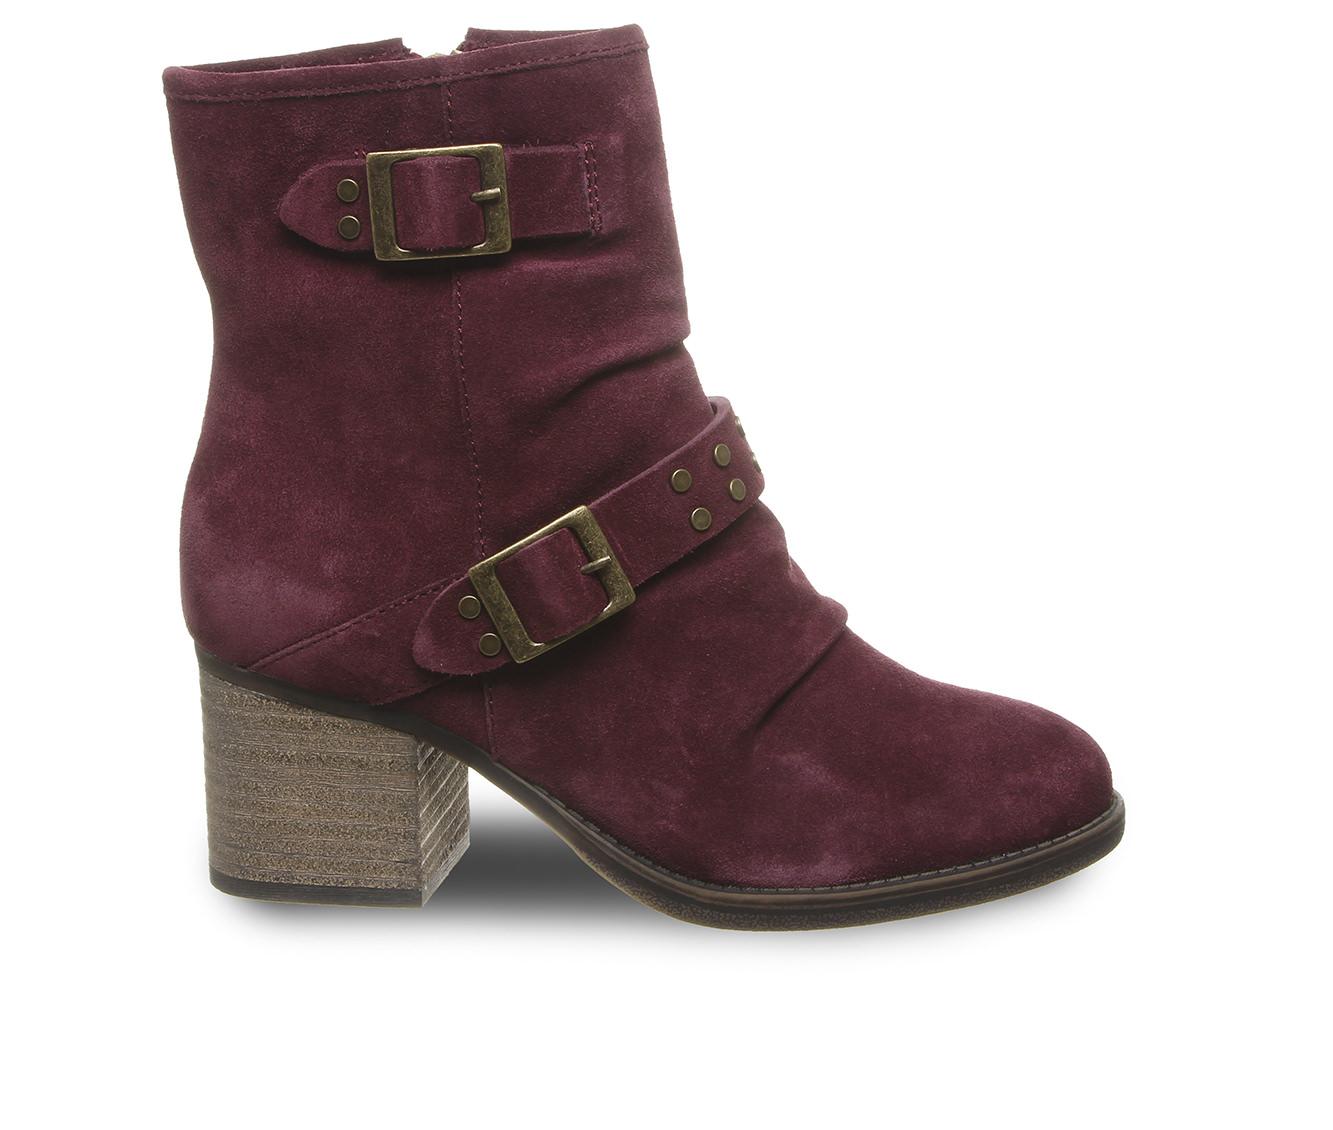 Bearpaw Amethyst Women's Boot (Red Suede)